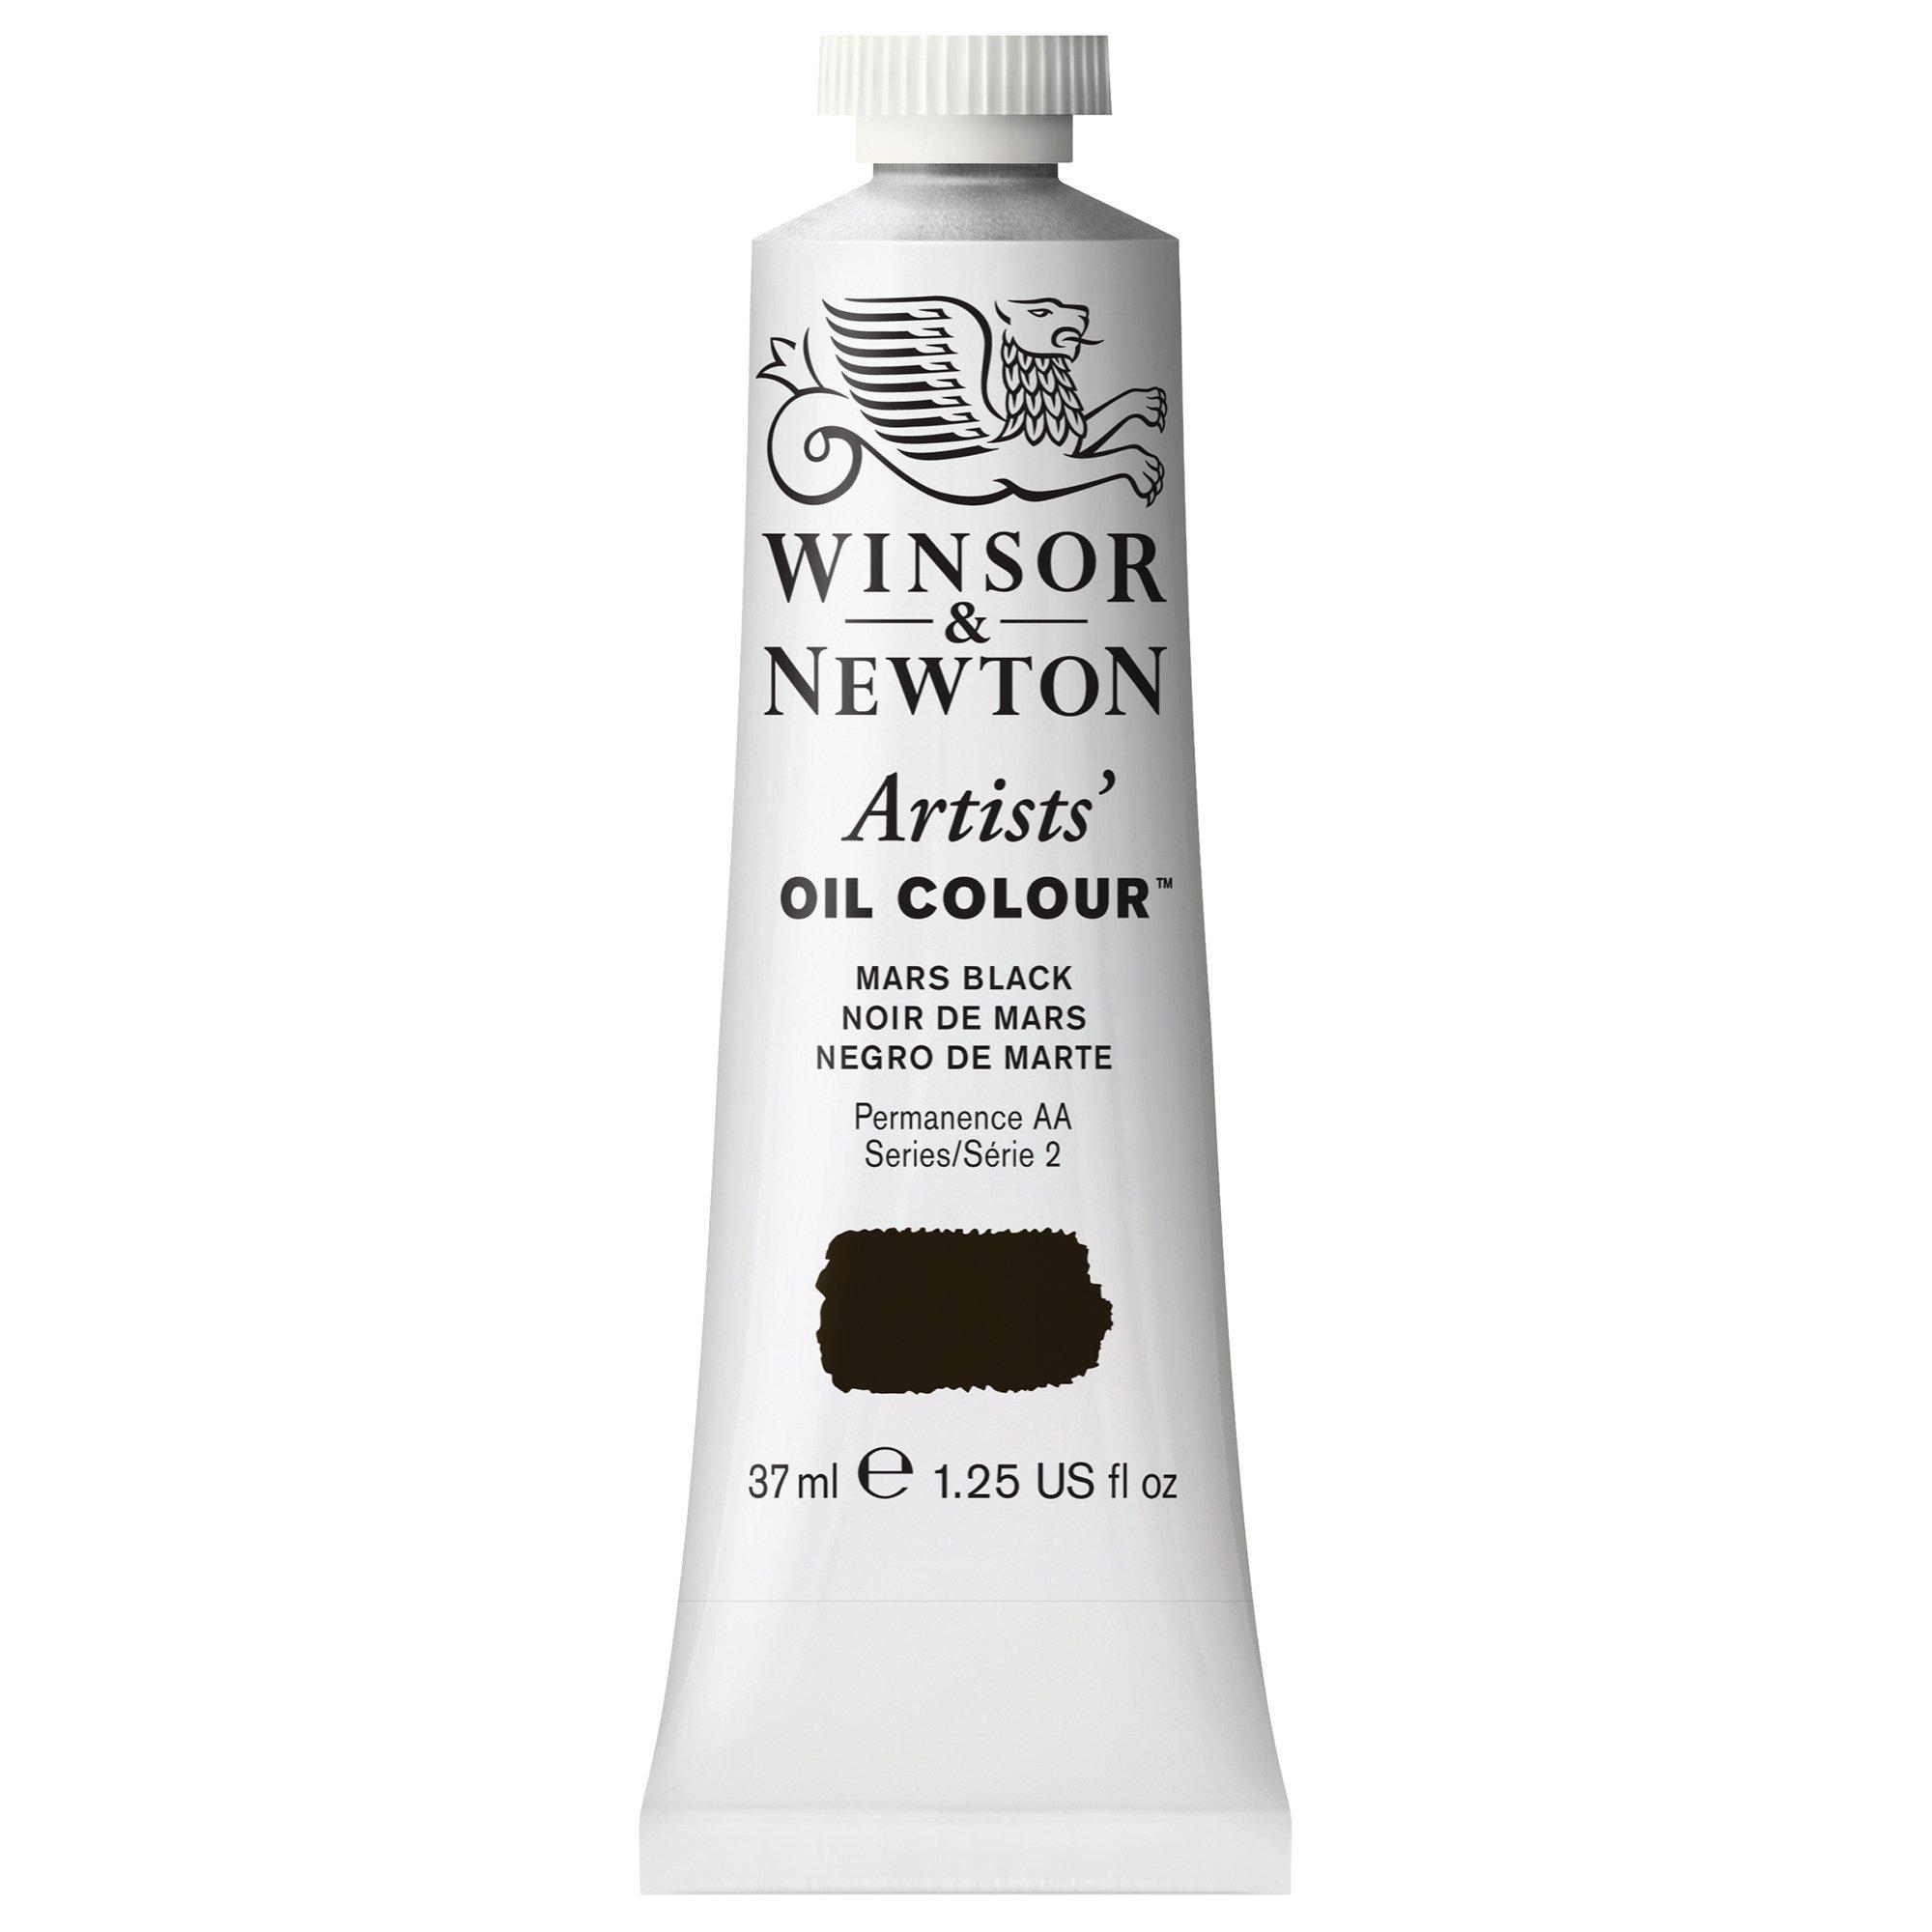 Winsor & Newton Artists' Oil Colour Paint, 37ml Tube, Mars Black